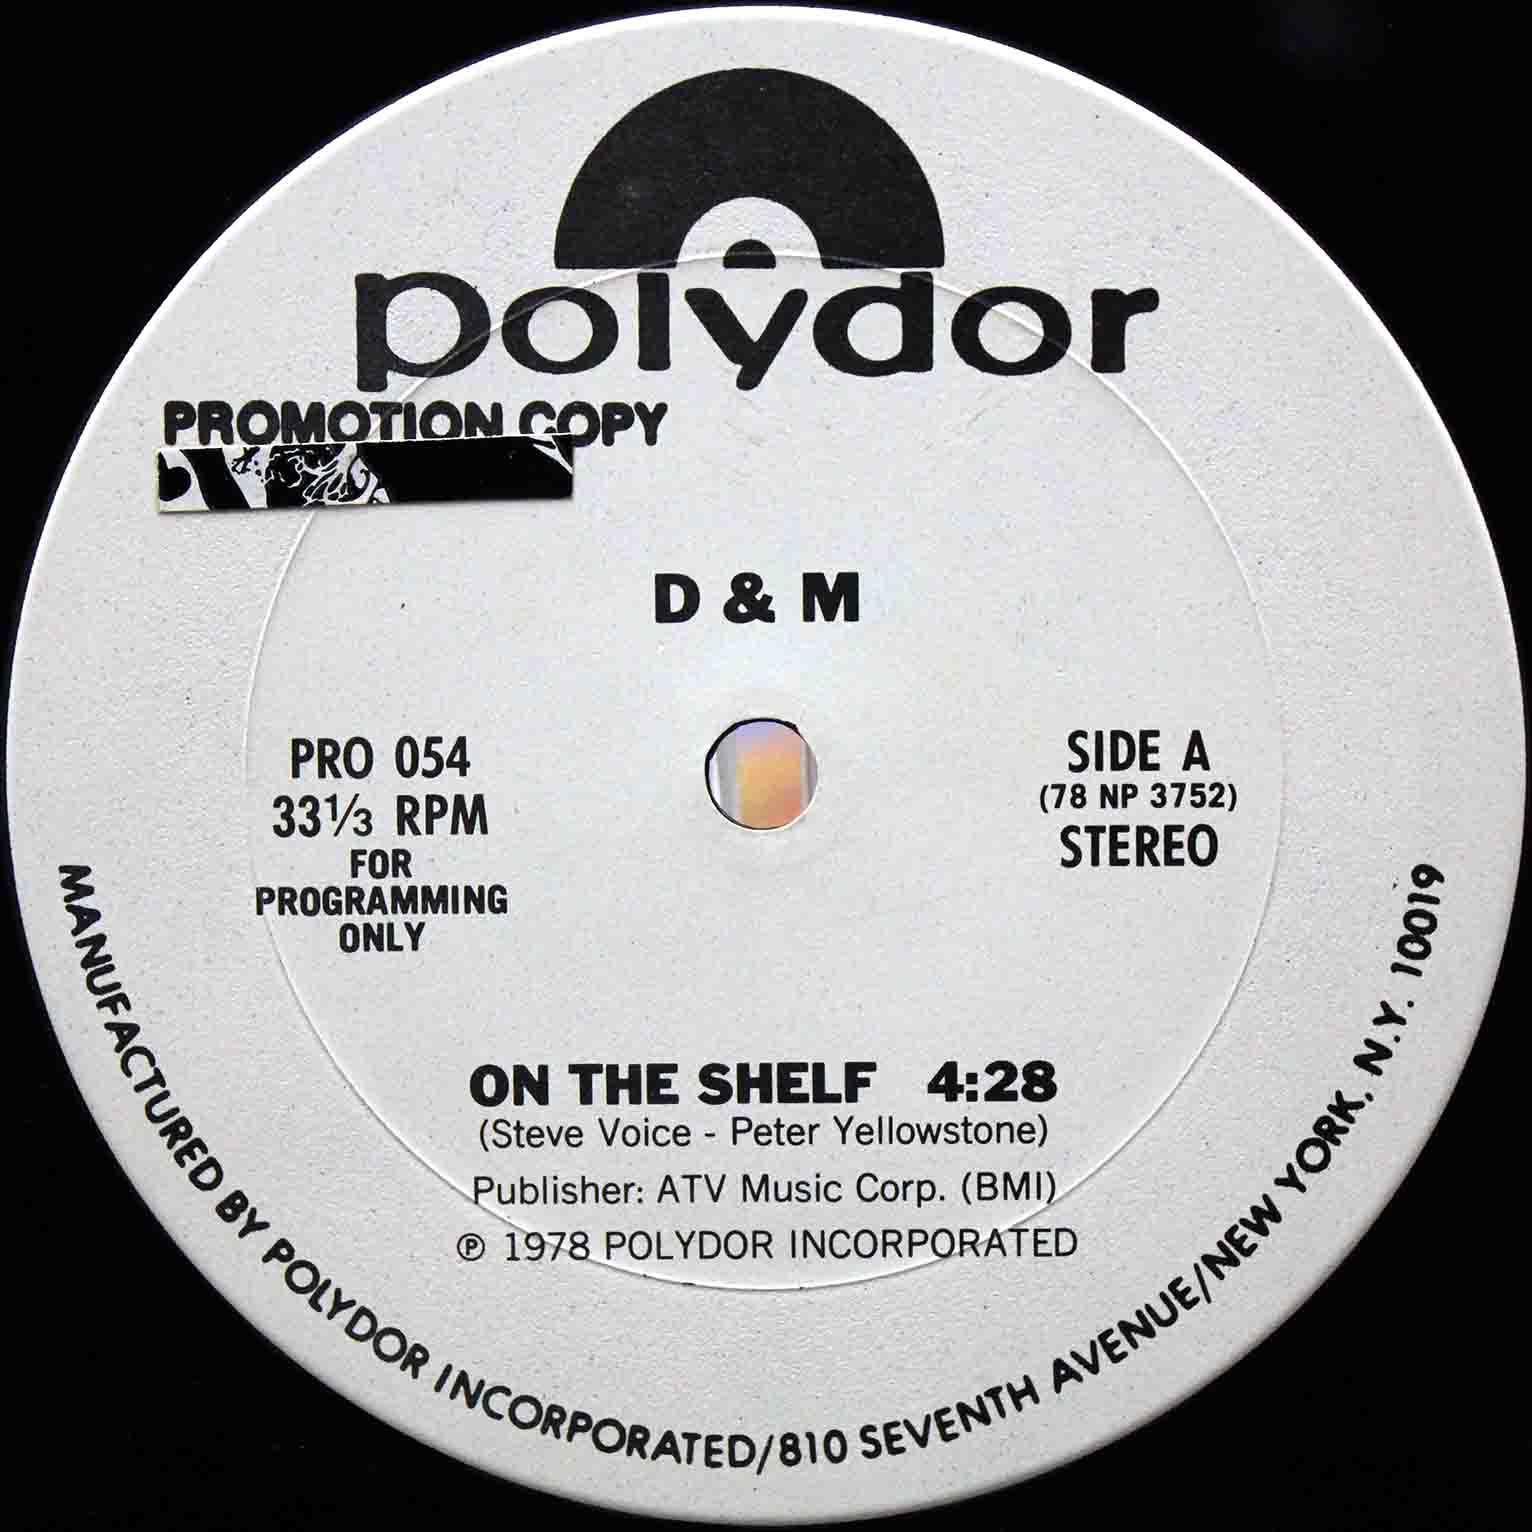 Donny Marie Osmond On The Shelf 02